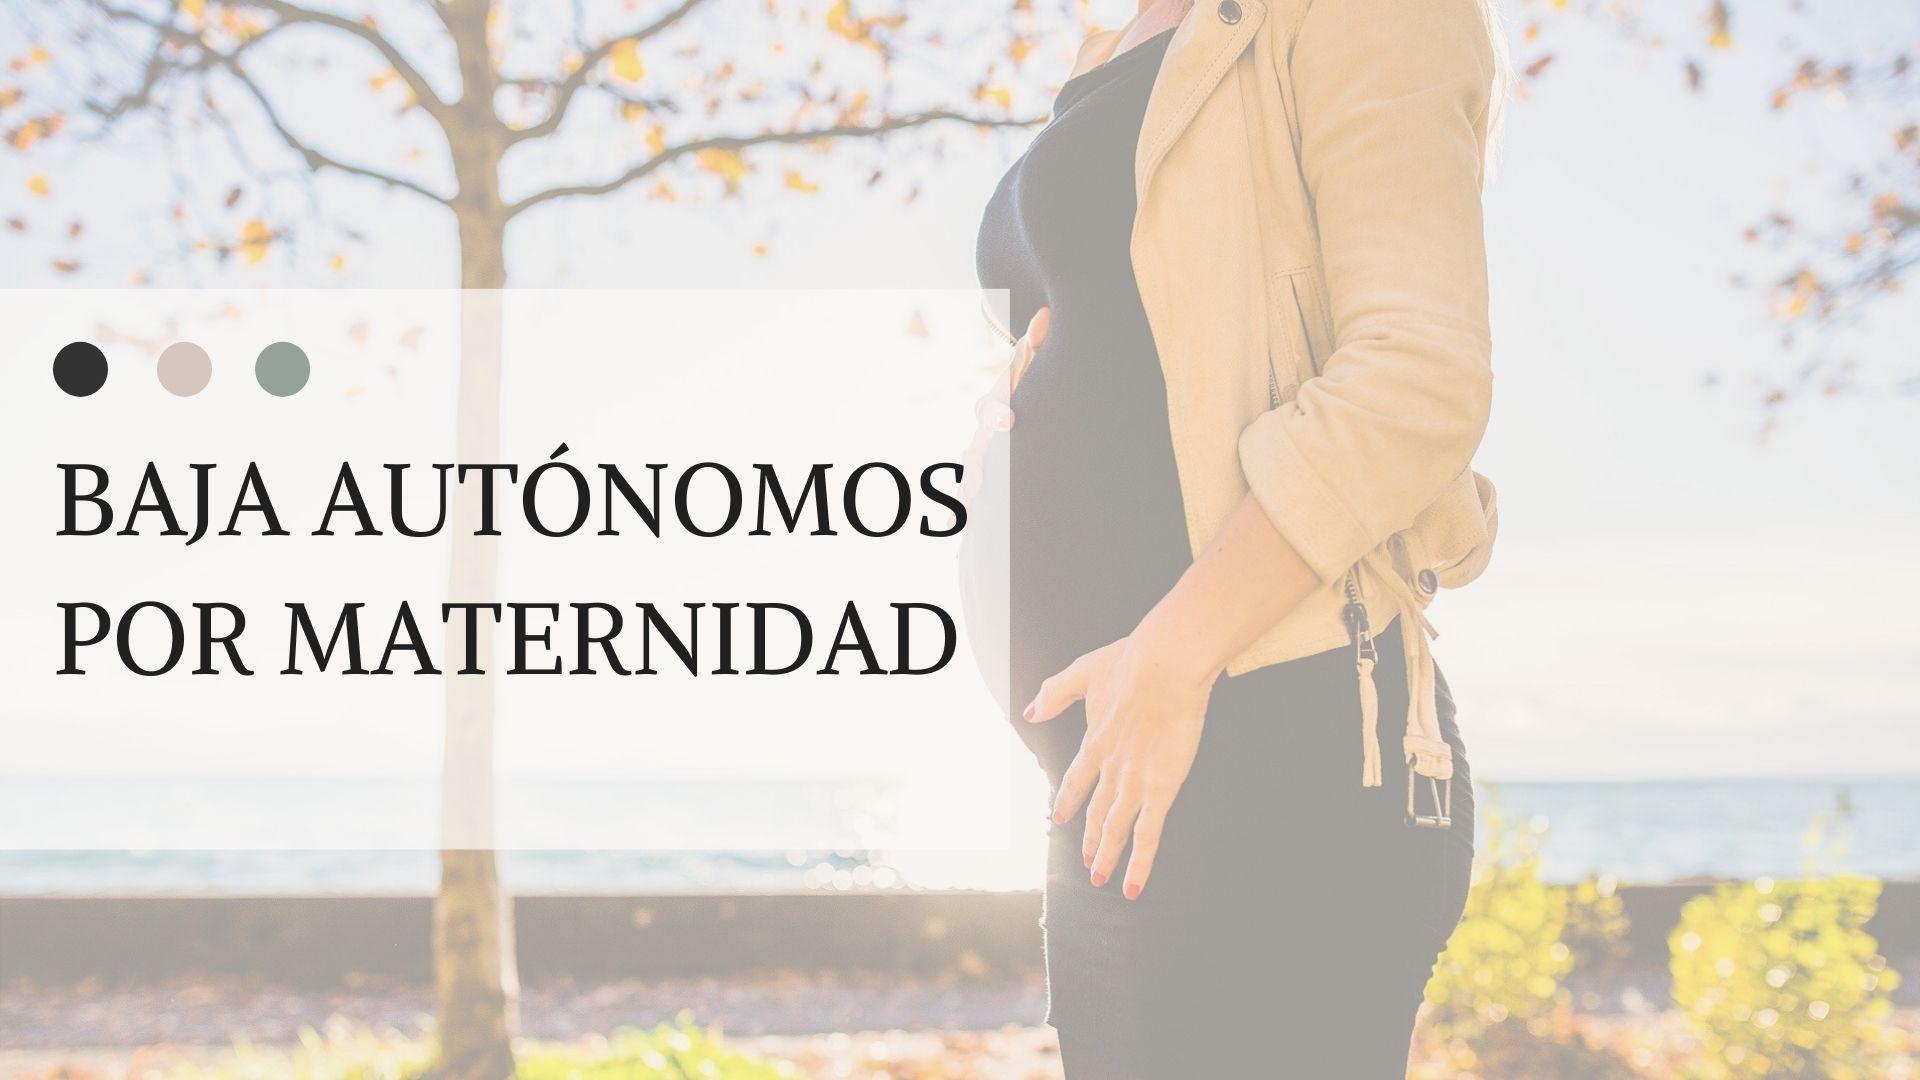 Baja autonomos por maternidad